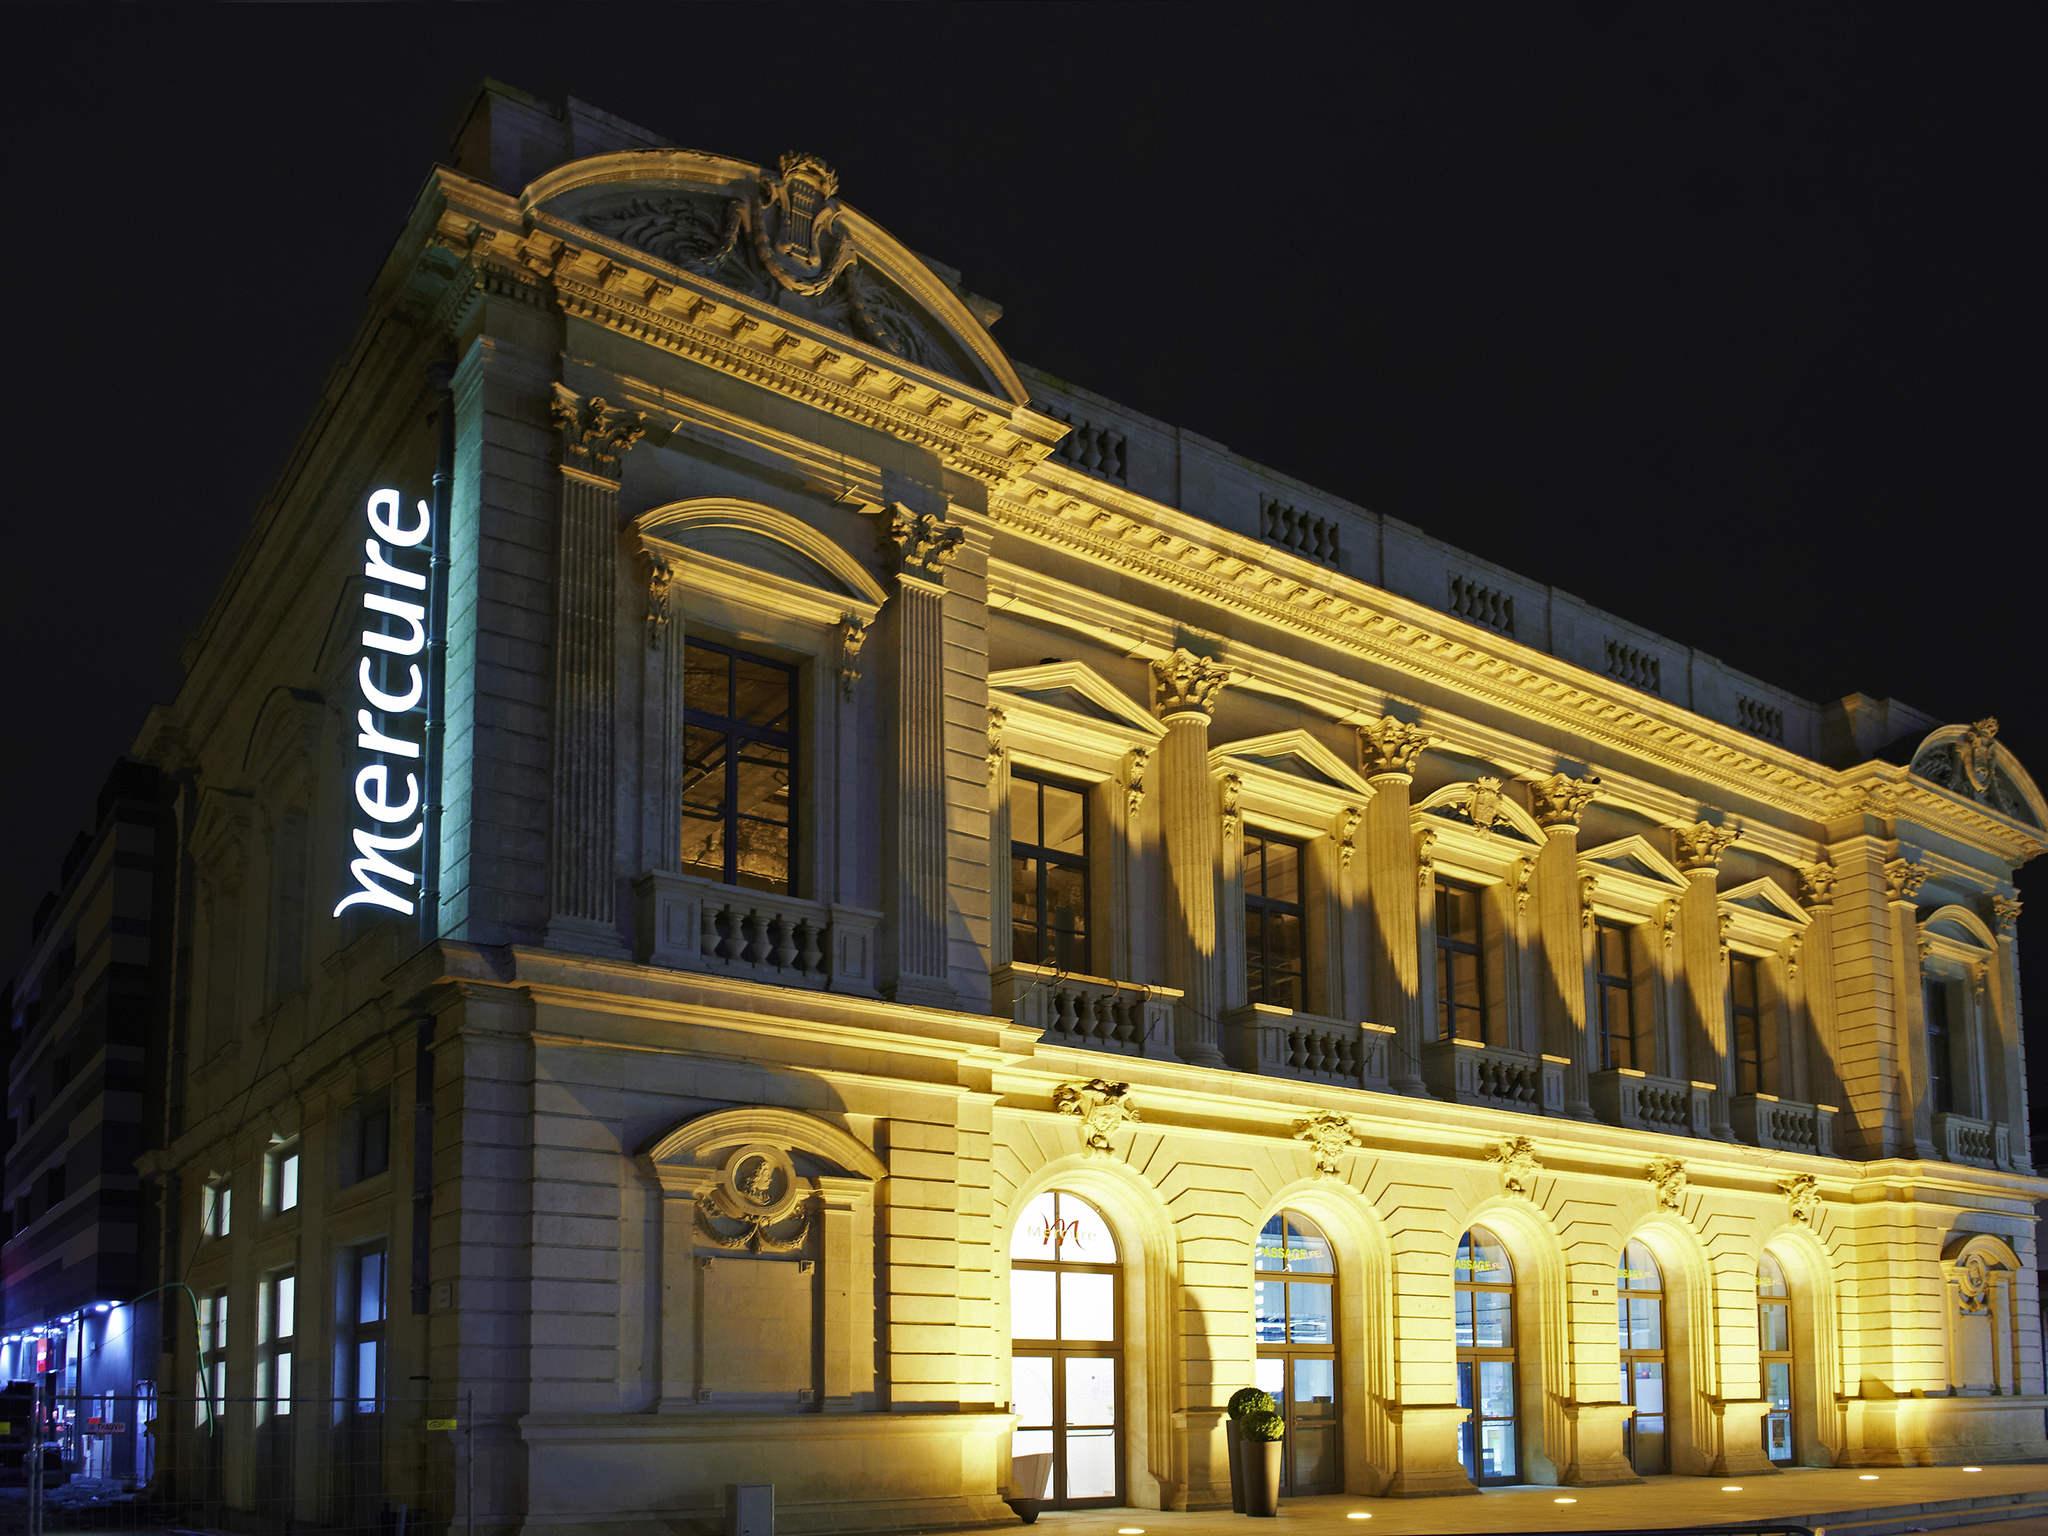 Hotel – Hotel Mercure Cholet Centre